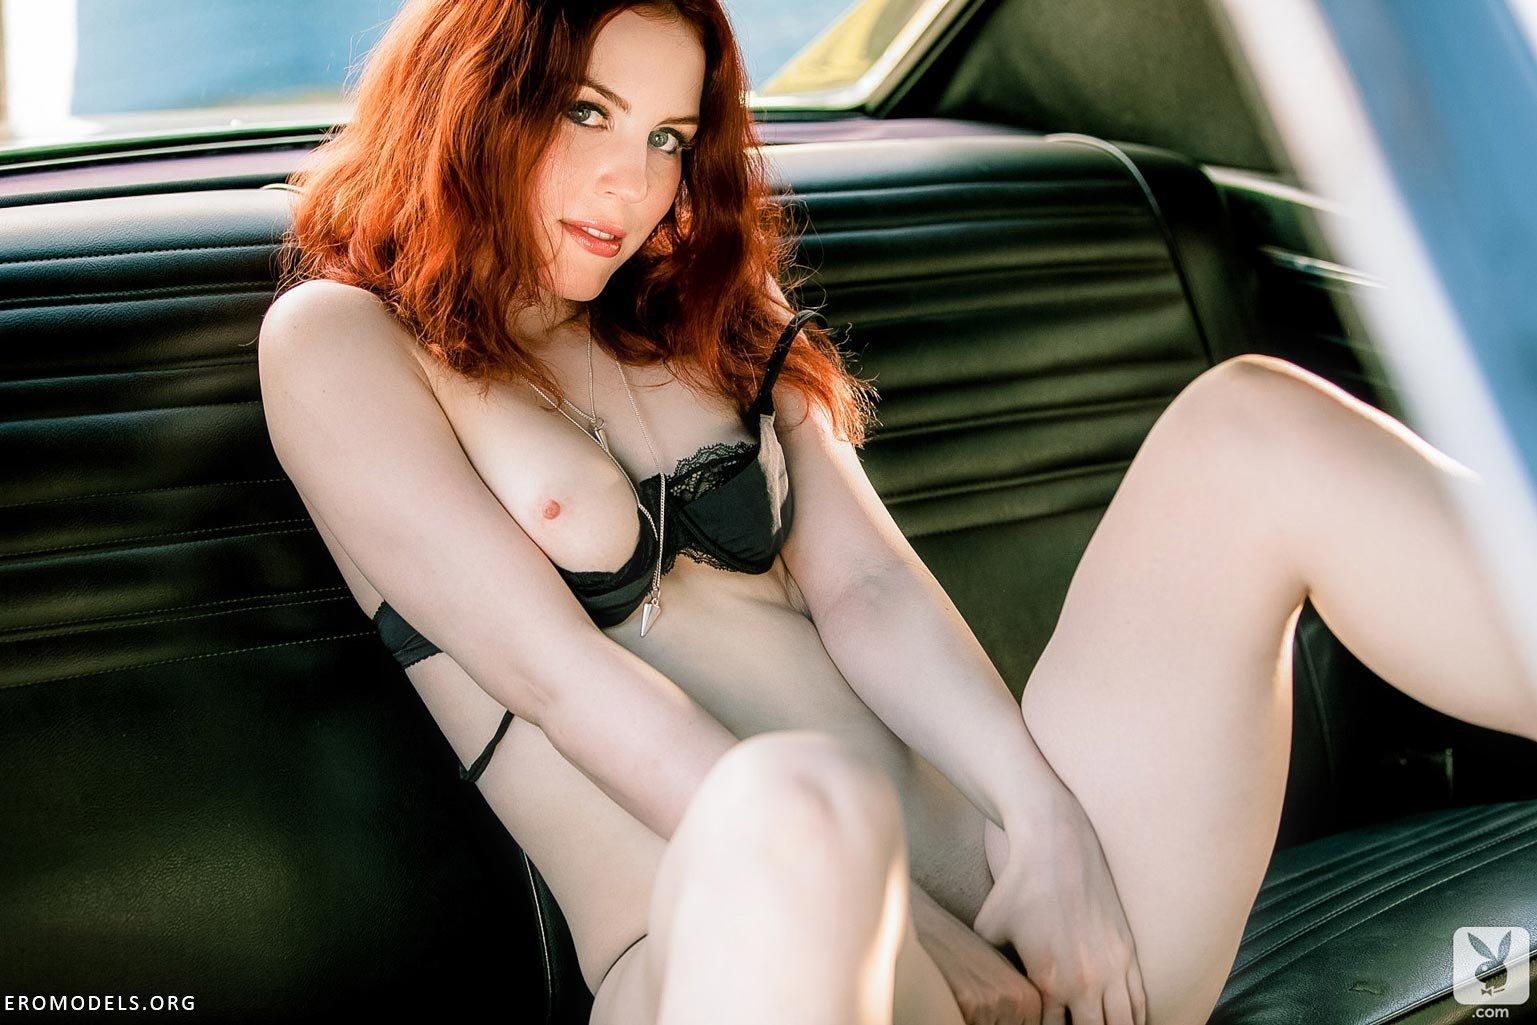 Эротика в салоне автомобиля, порно відео с японской